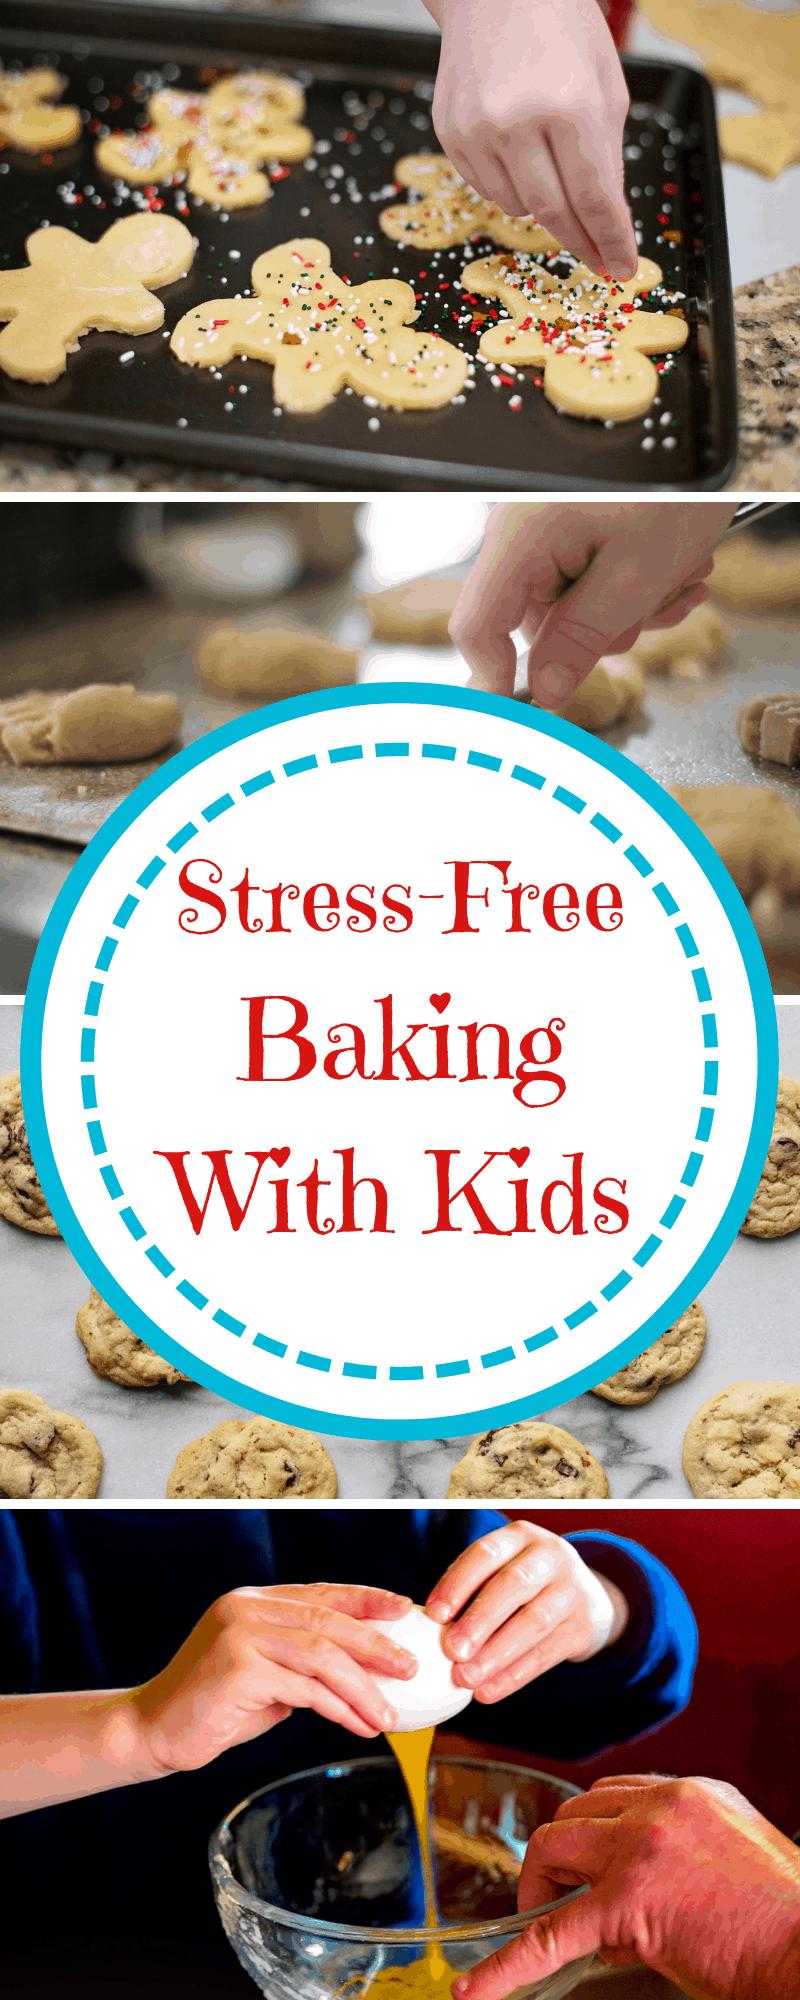 stress-free baking with kids